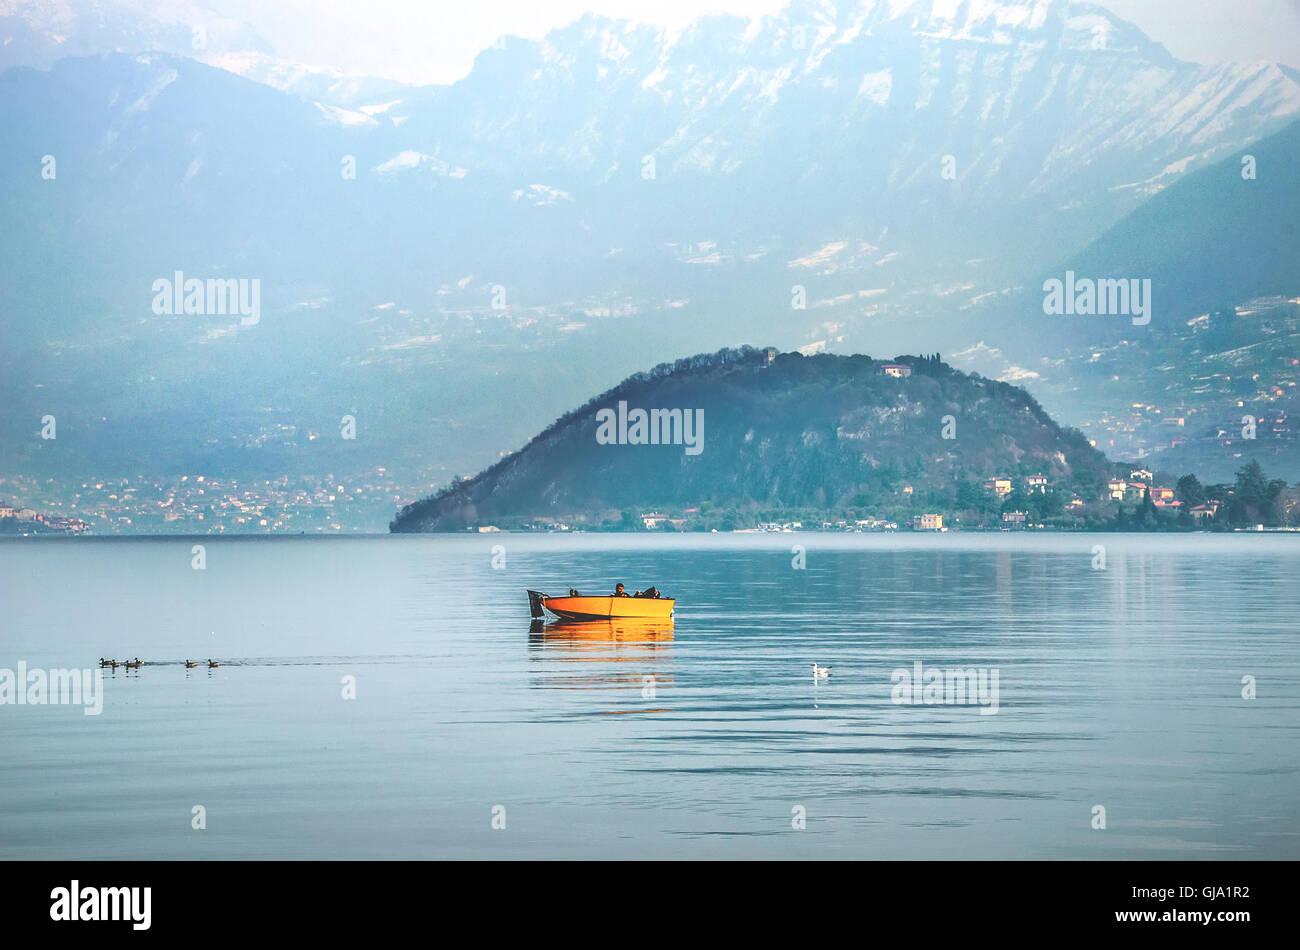 lago d'iseo - Stock Image